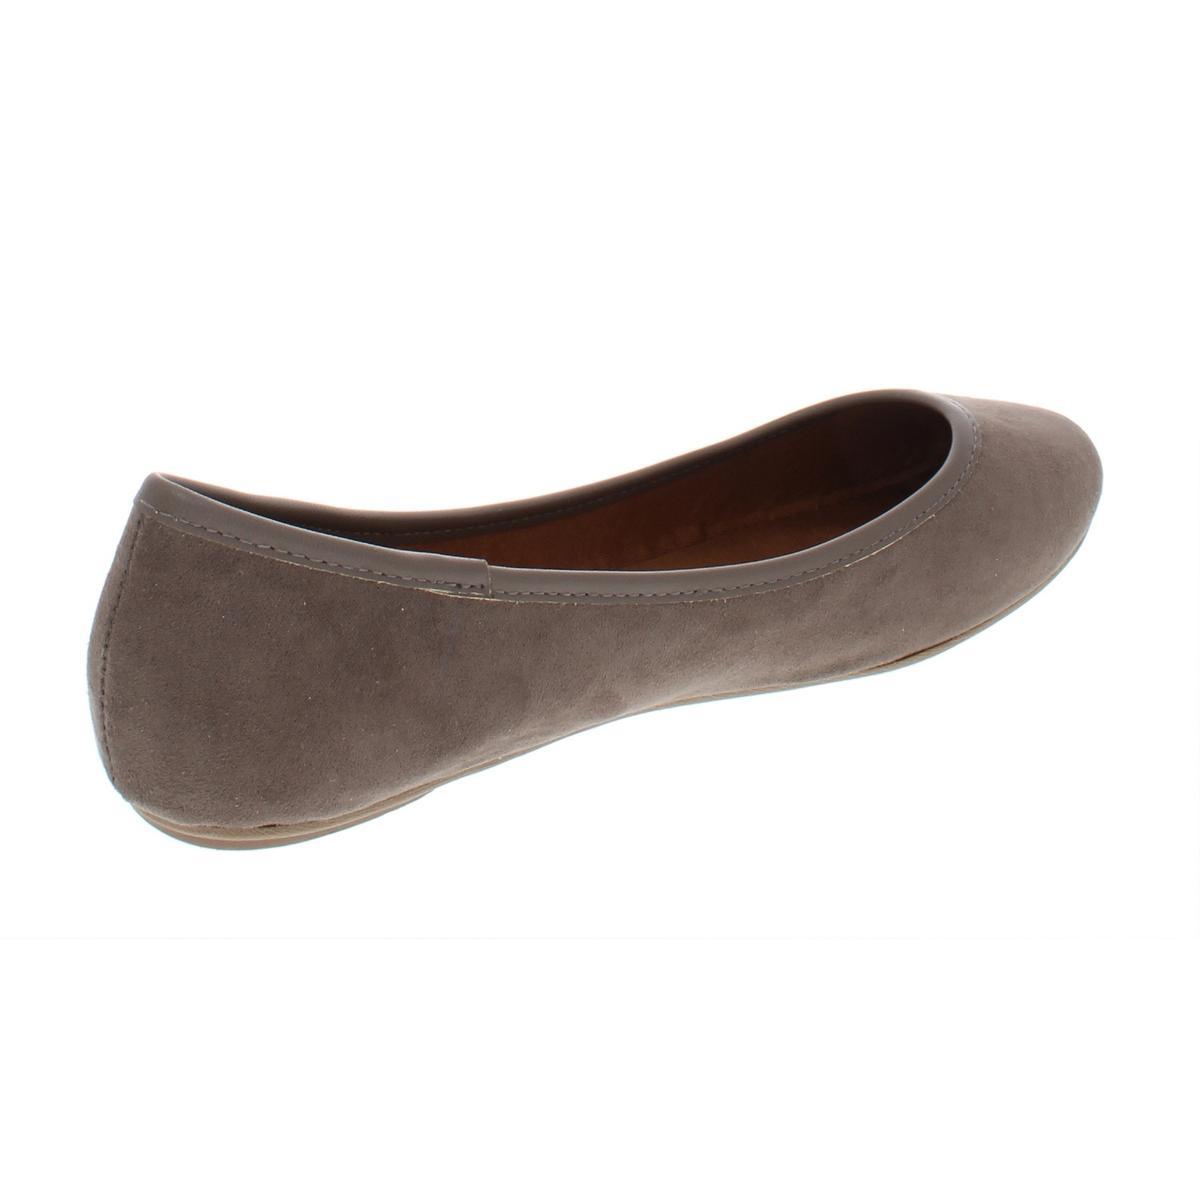 American-Rag-Womens-Cellia-Contrast-Trim-Slip-On-Ballet-Flats-Shoes-BHFO-6452 thumbnail 12